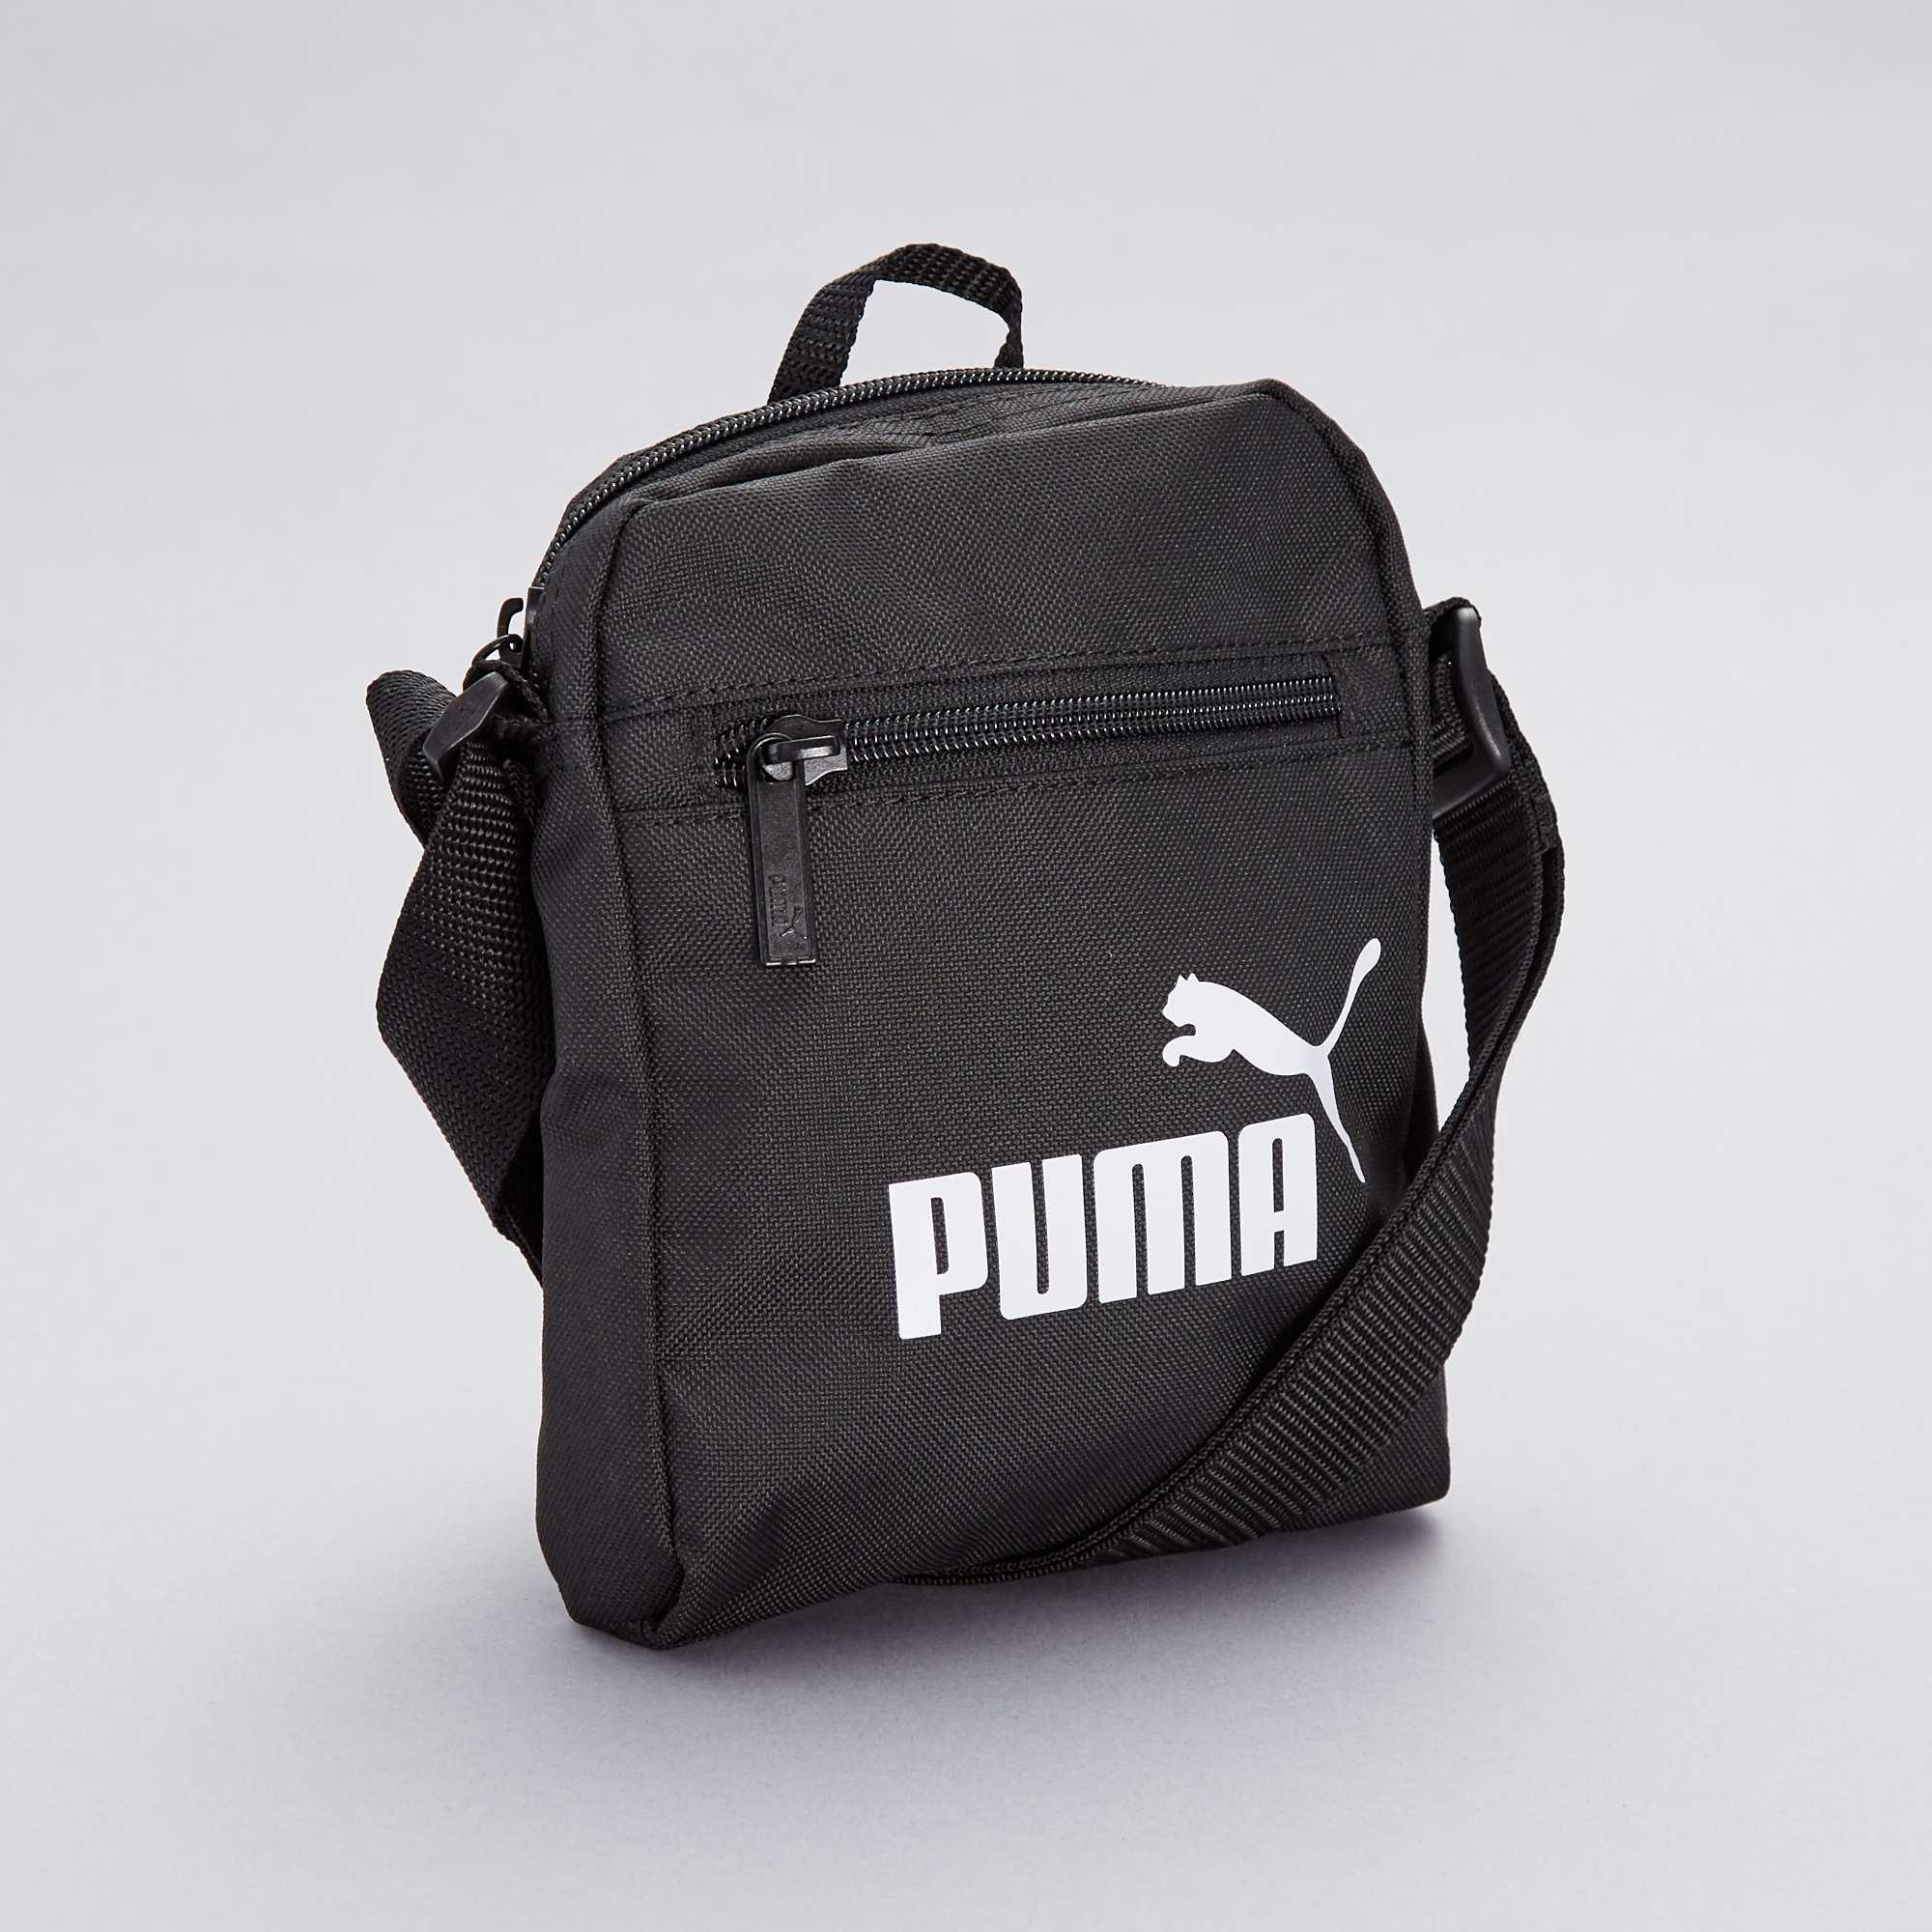 e9886903cc6 Bolso bandolera  Puma  Hombre - NEGRO - Kiabi - 13